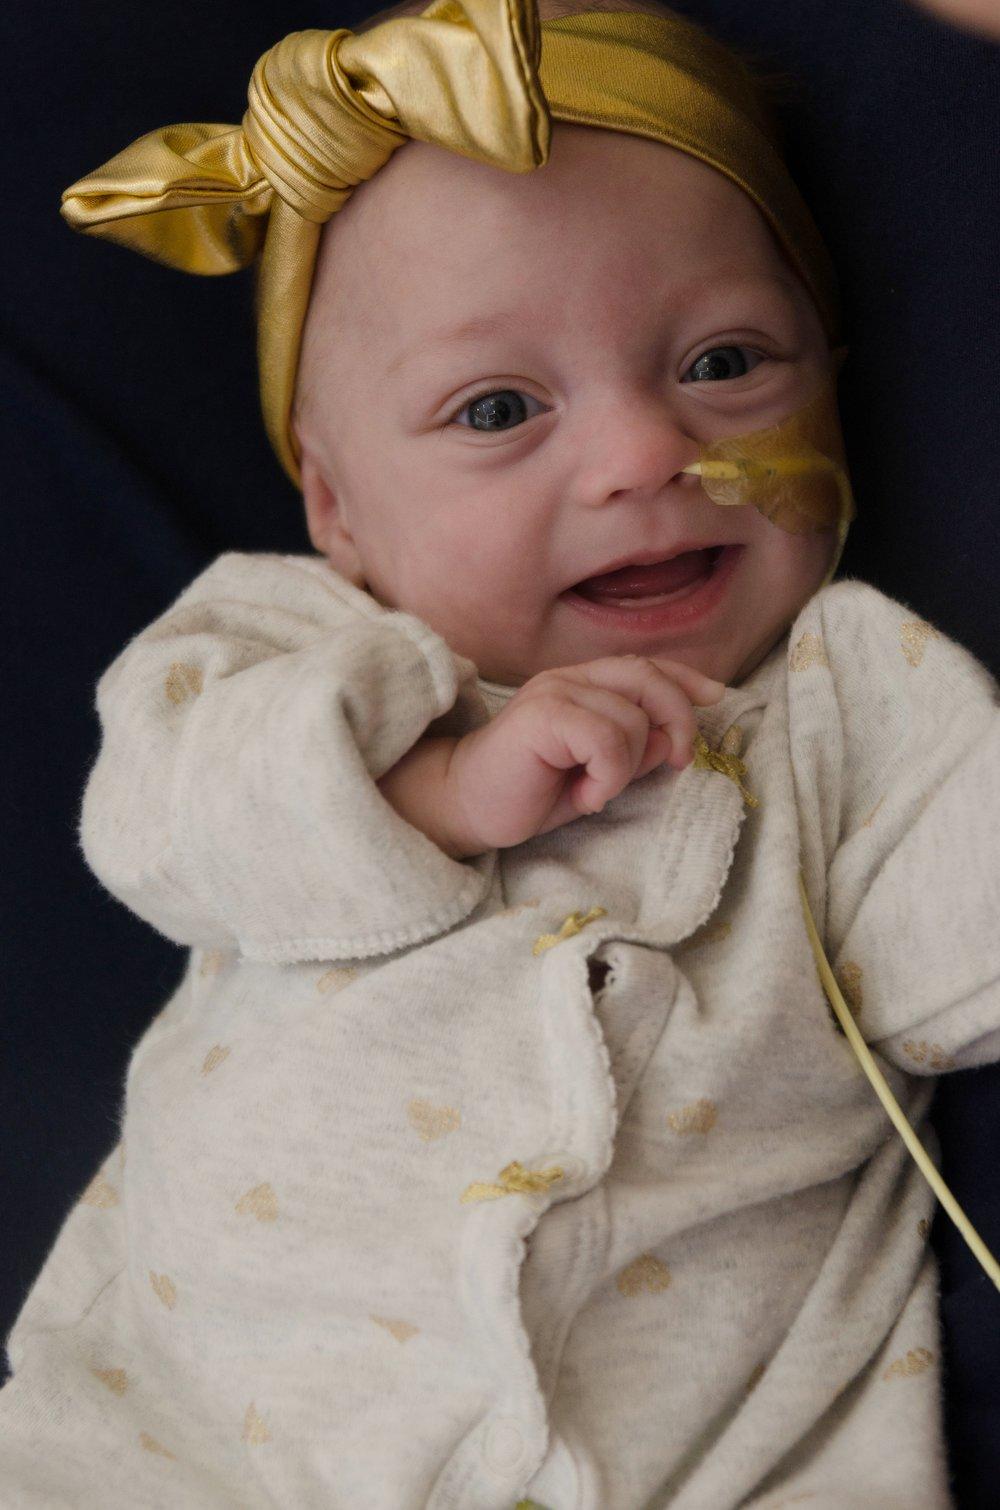 oral aversion - feeding tube awareness - shegotguts.com